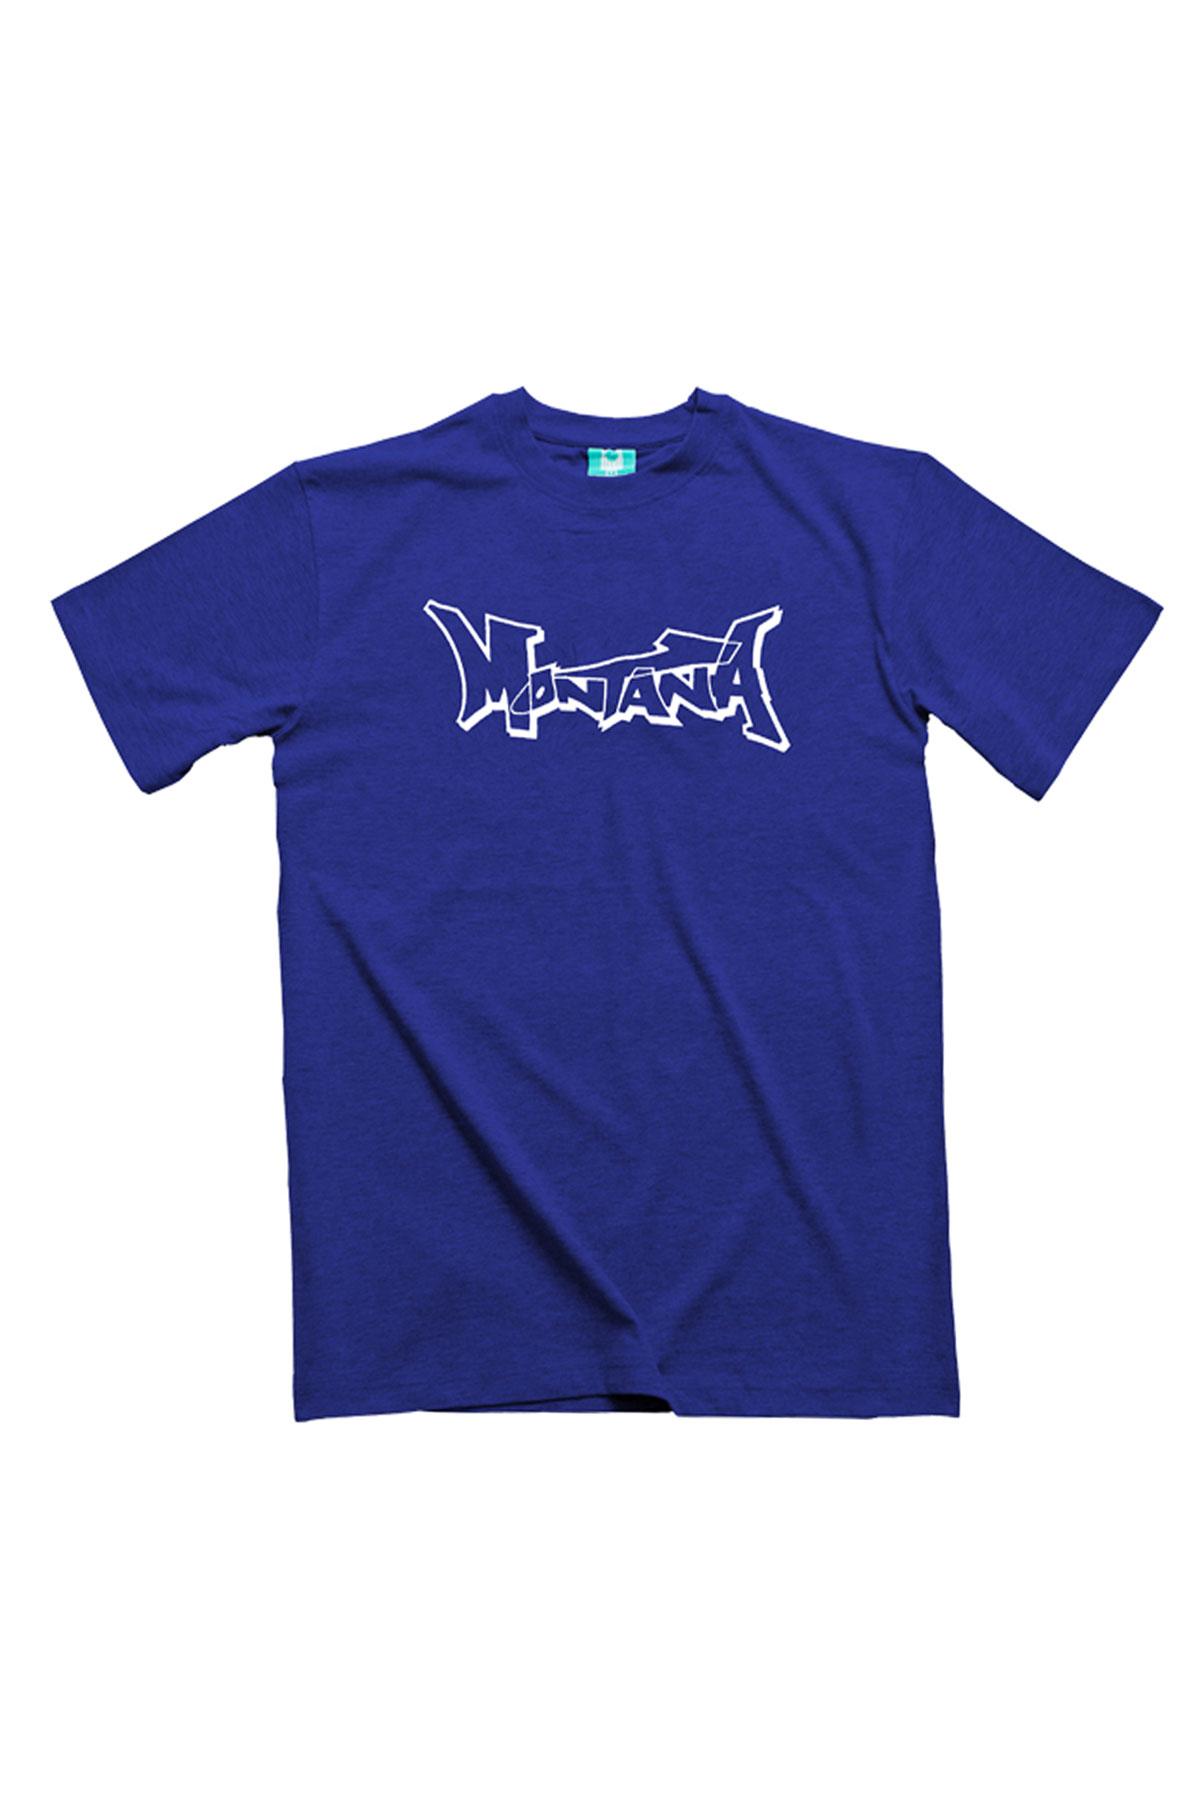 Montana LOGO Royal Blue T-Shirt